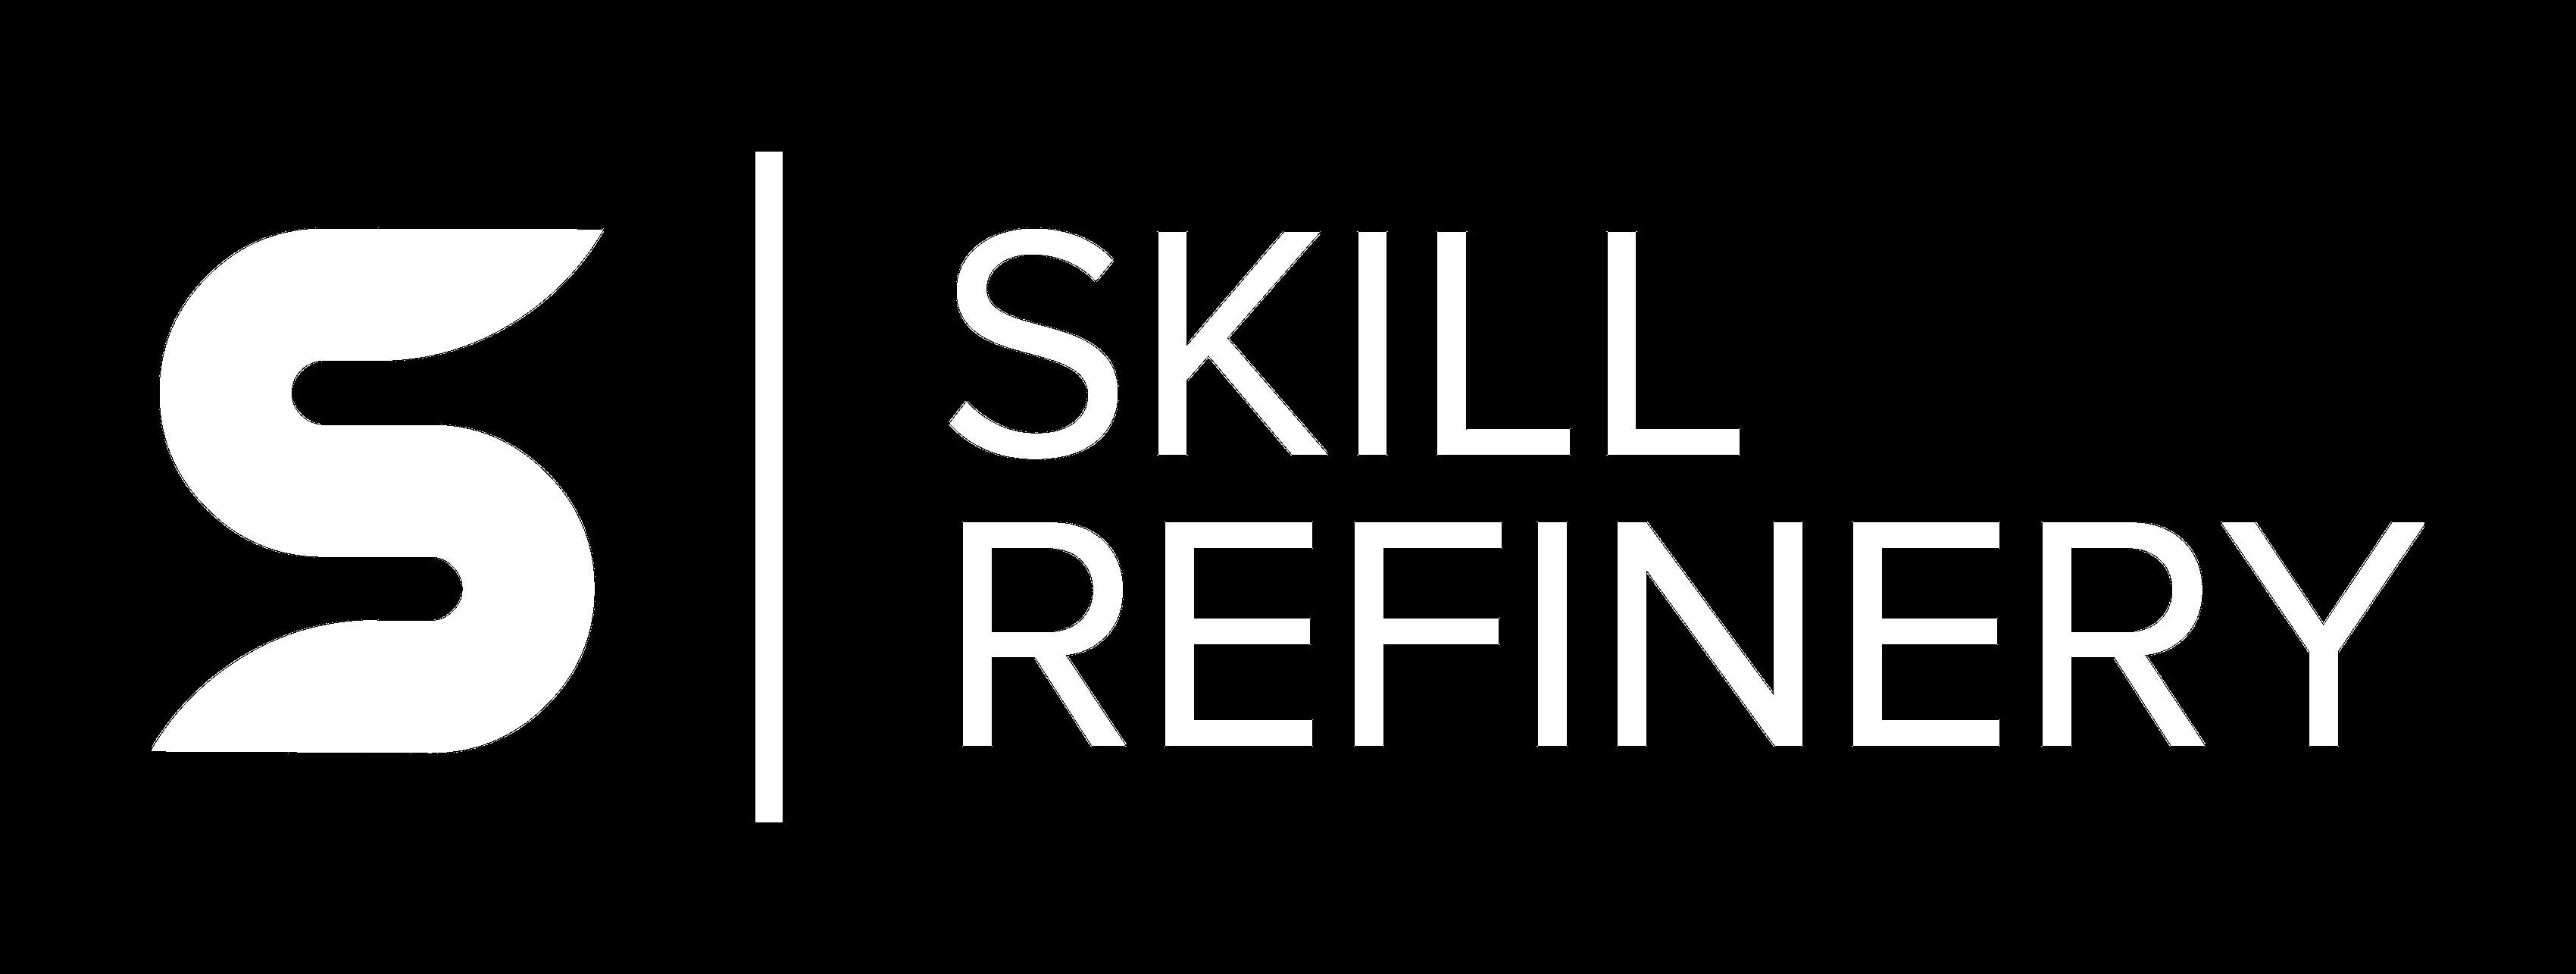 Skill Refinery